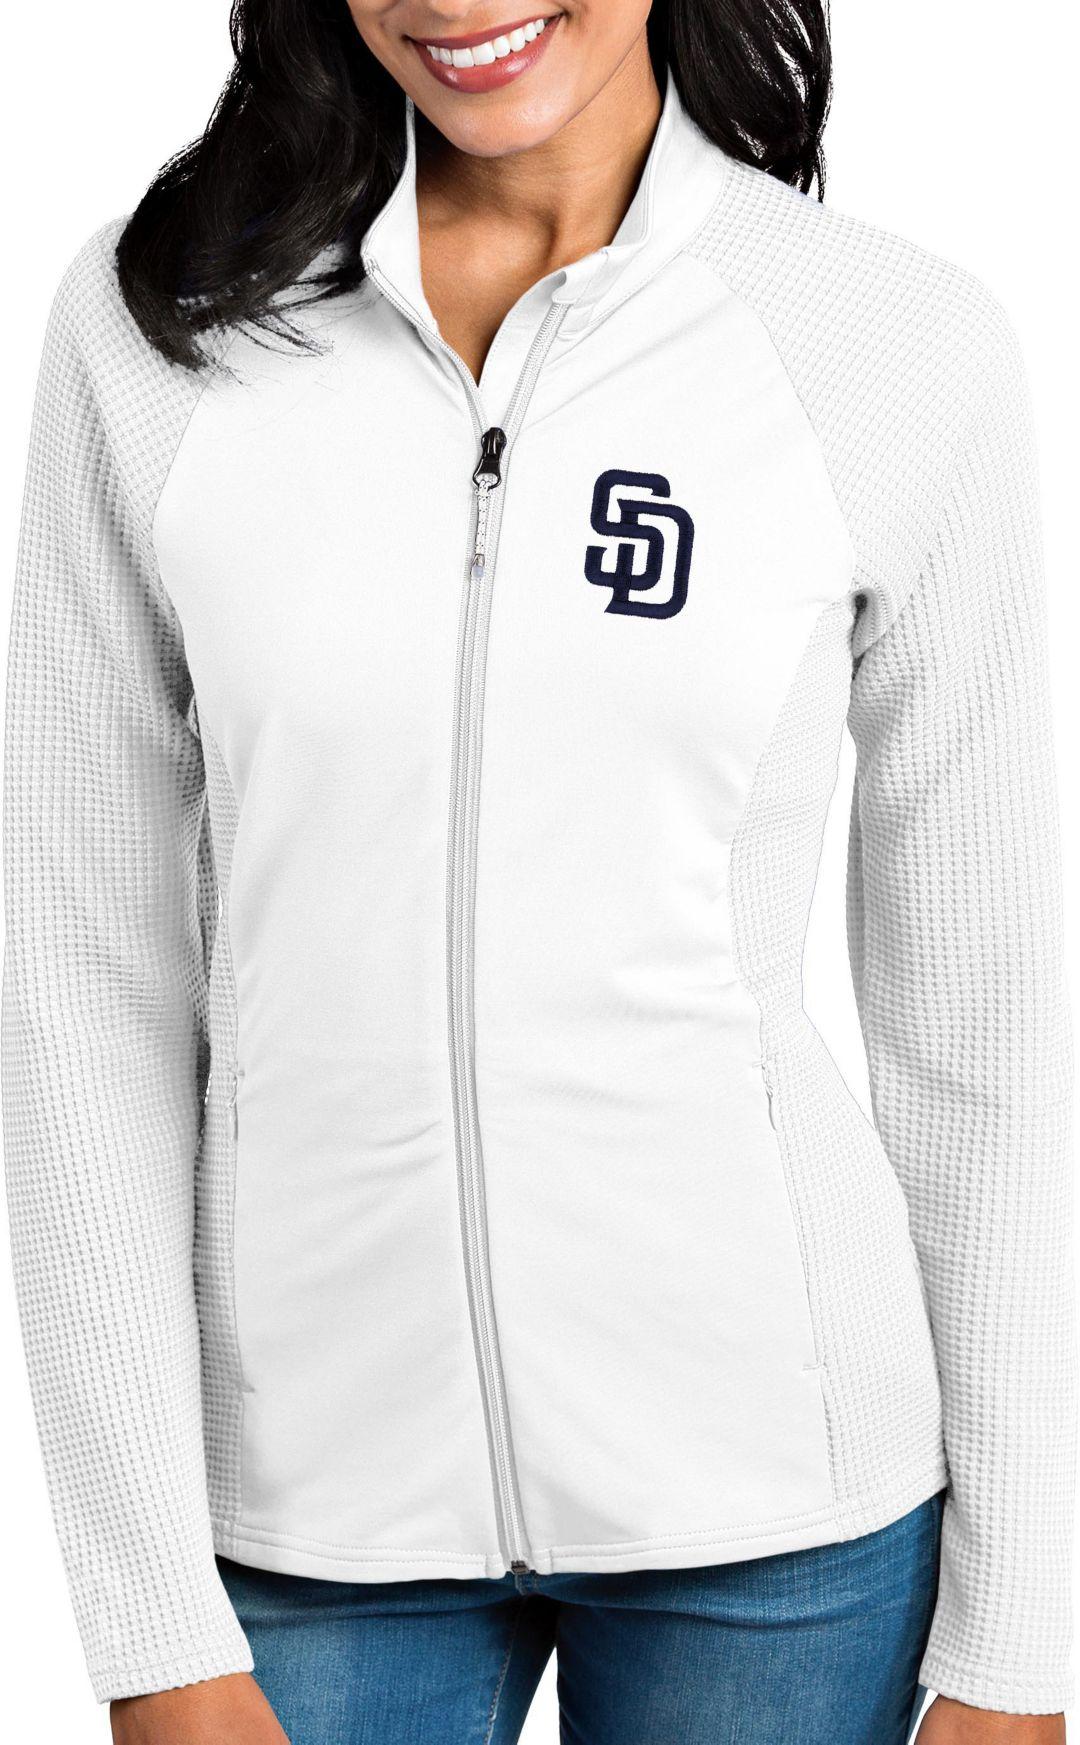 classic fit 63136 830c7 Antigua Women's San Diego Padres White Sonar Performance Quarter-Zip  Pullover